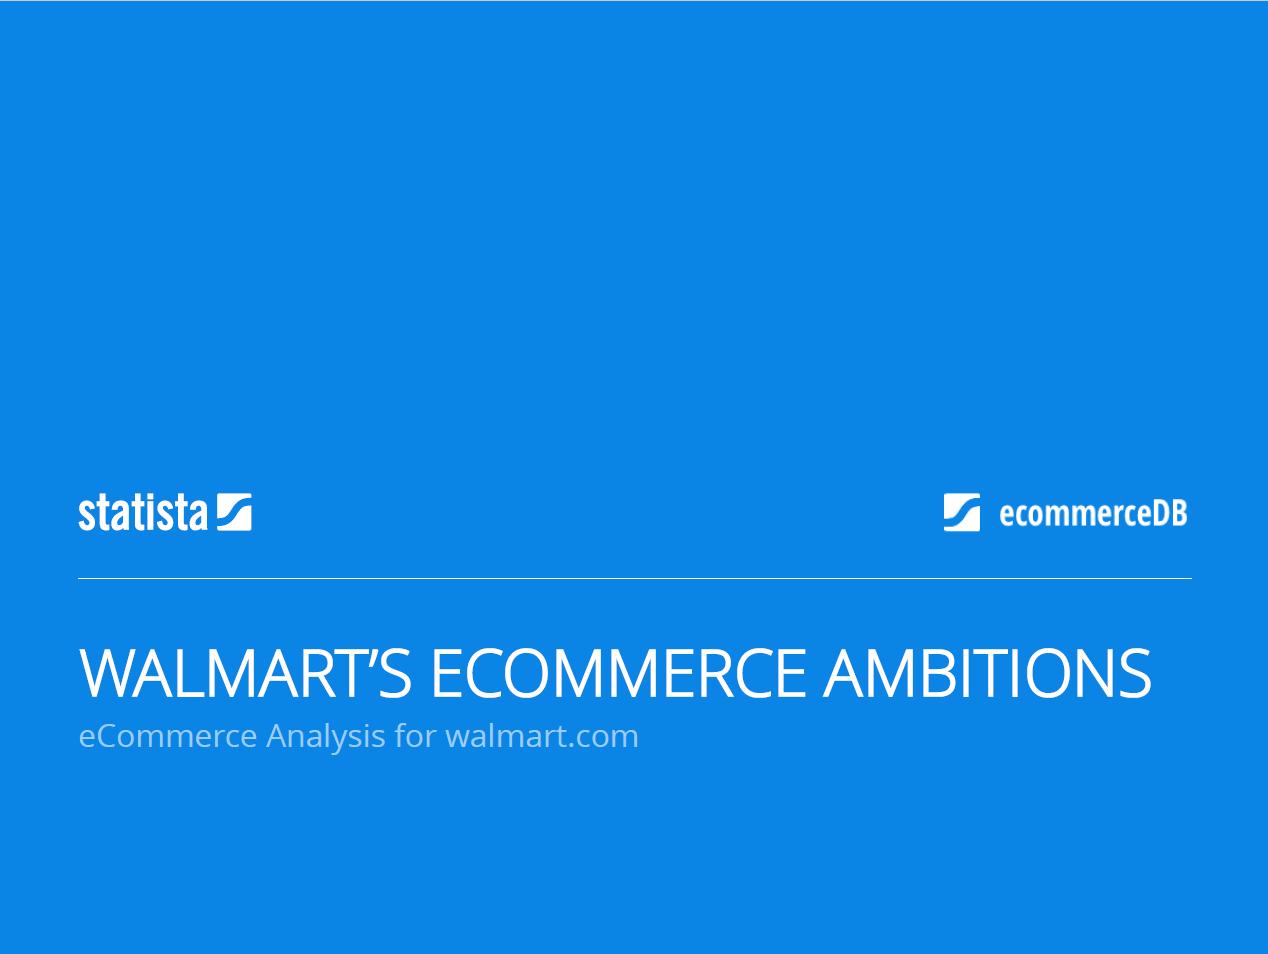 Walmart's eCommerce Ambitions